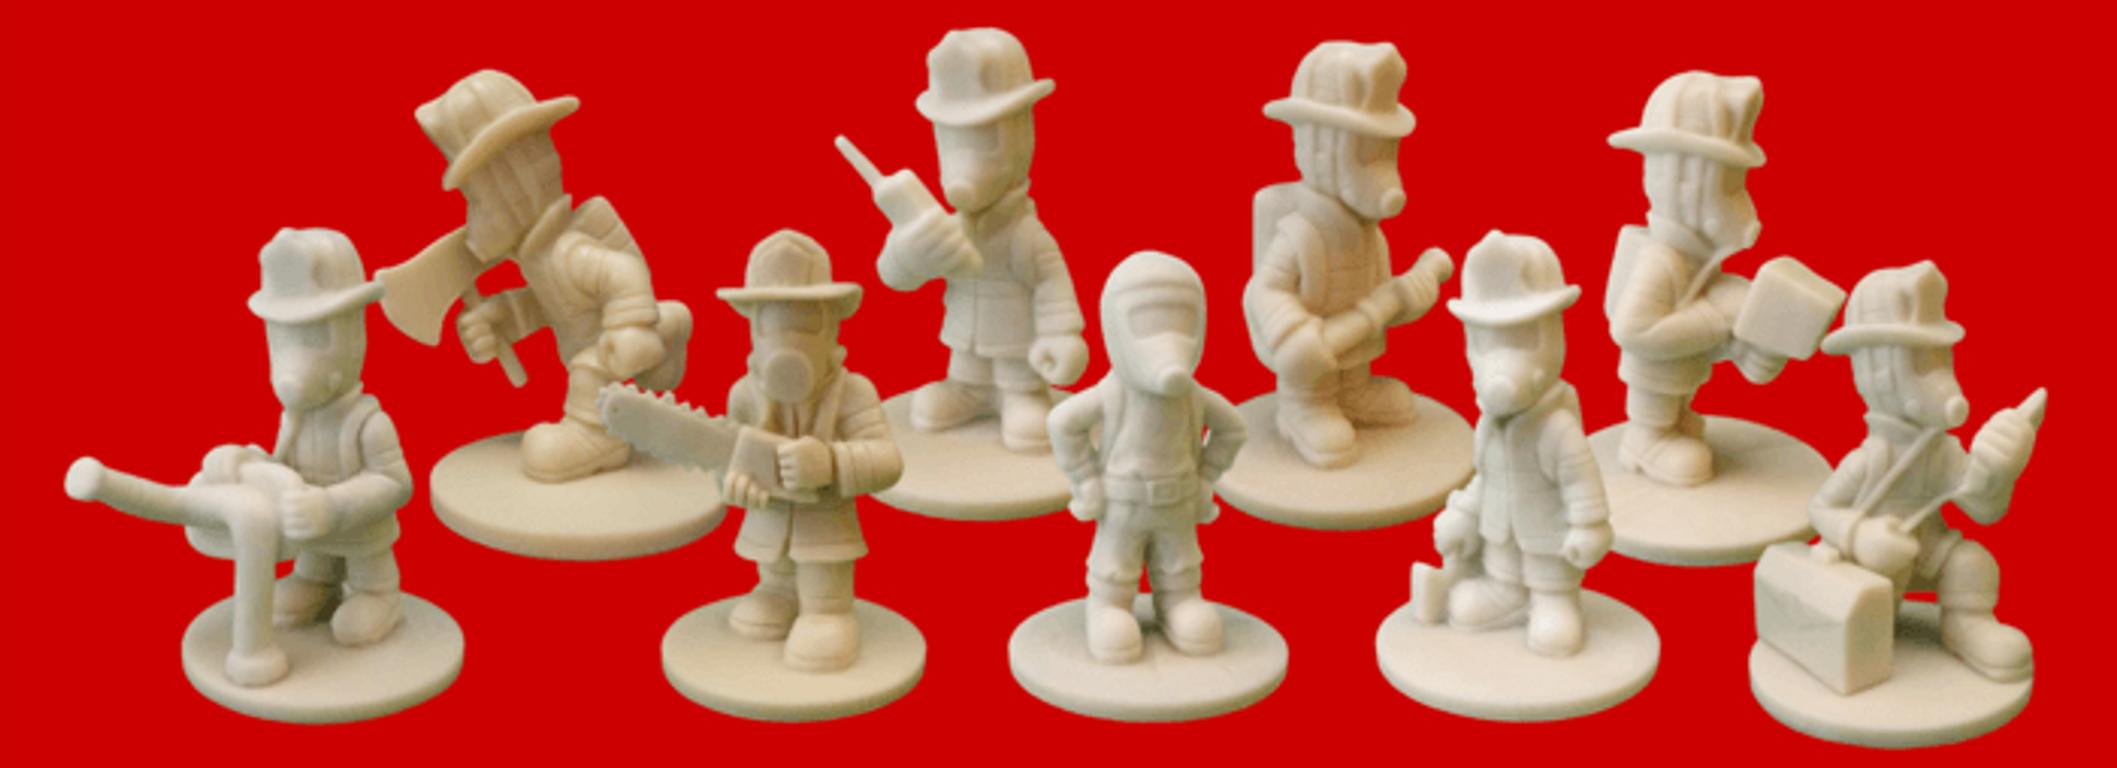 Flash Point: Fire Rescue - Extreme Danger miniatures